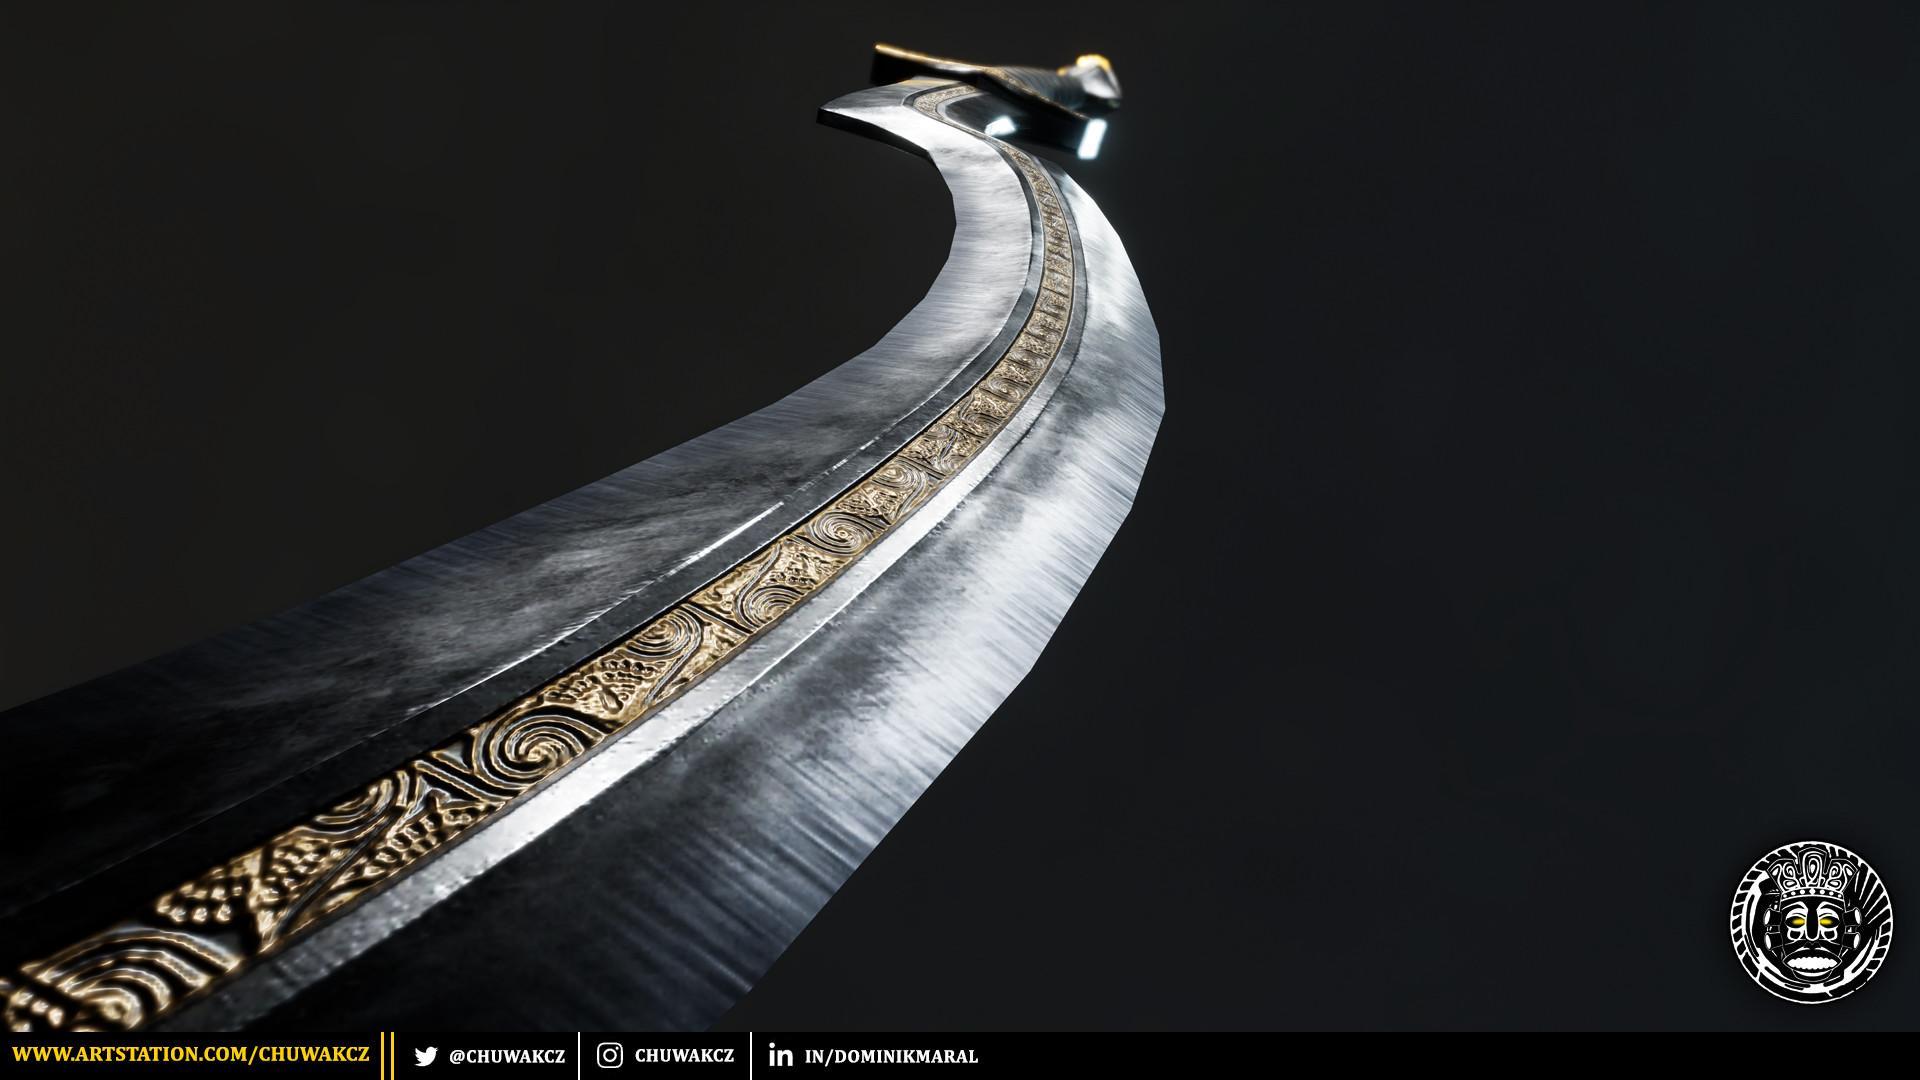 Dominik maral steelblade